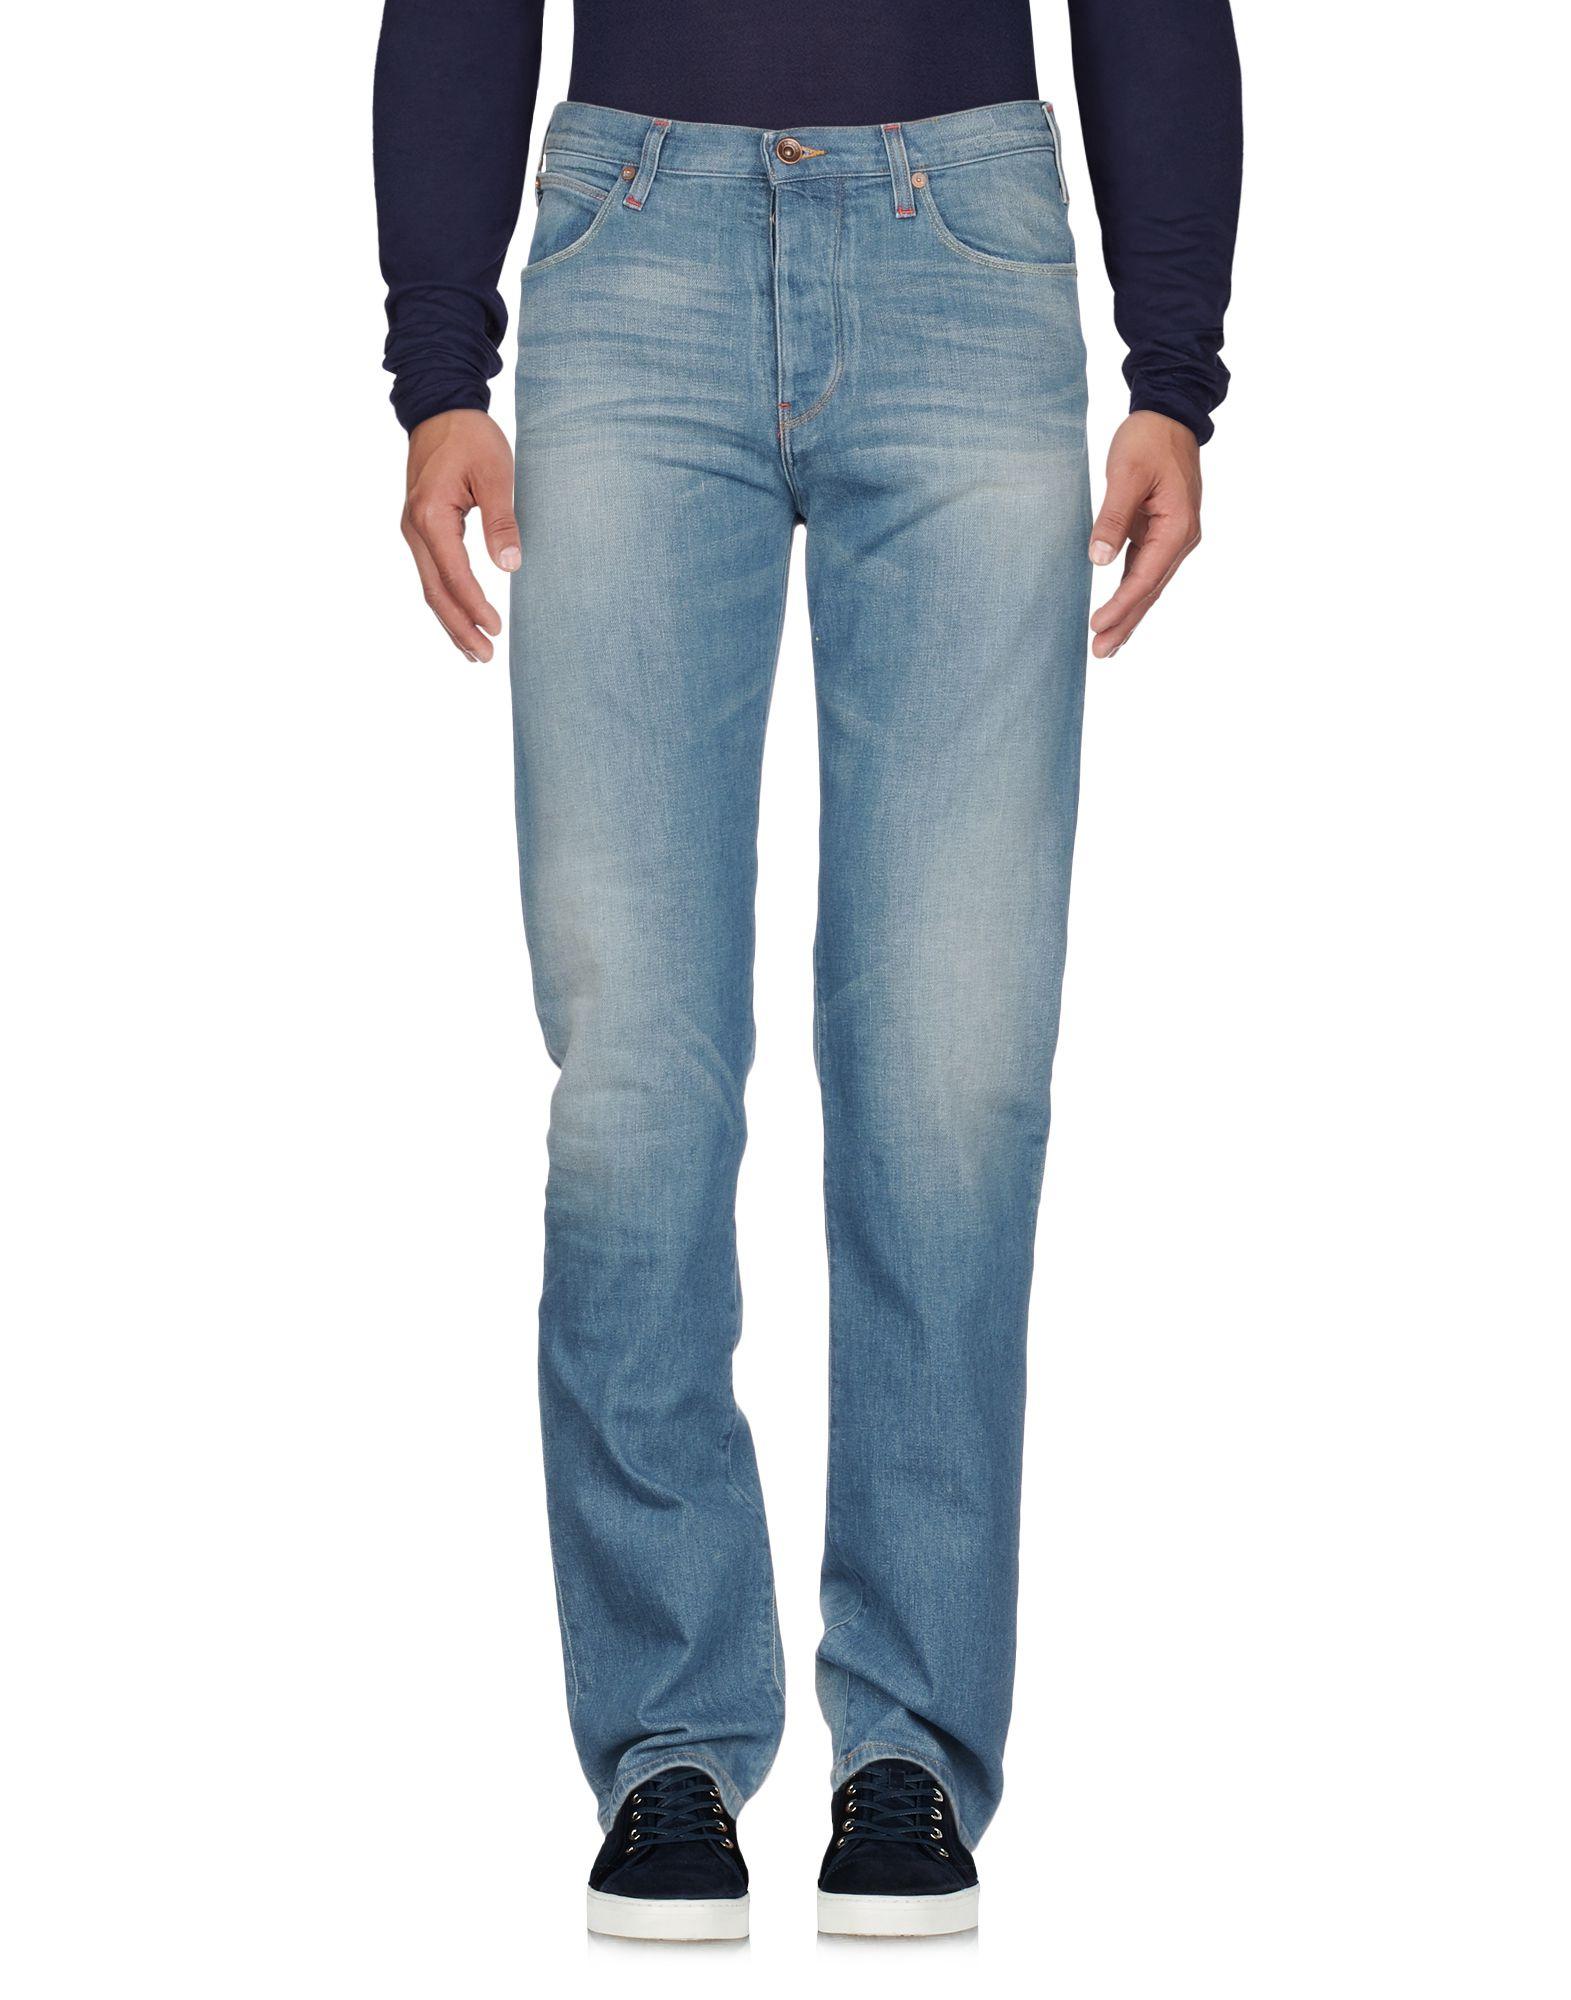 Pantaloni Jeans Armani Jeans - Uomo - Jeans 42683580JE c919f3